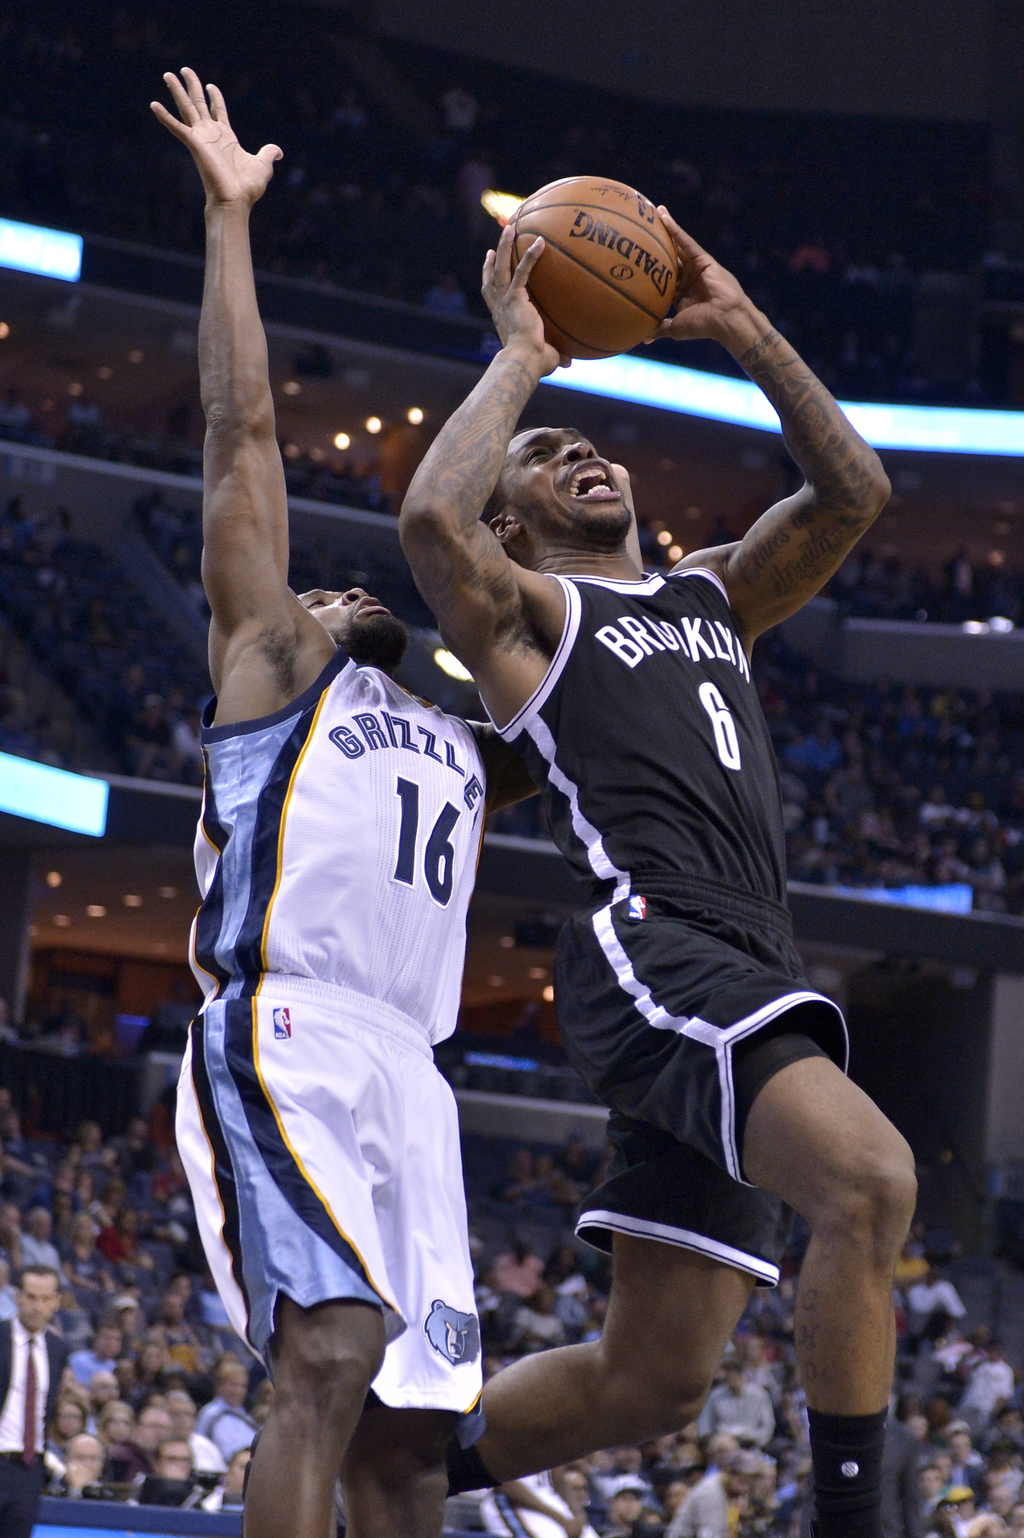 Brooklyn Nets guard Sean Kilpatrick (6) shoots against Memphis Grizzlies guard Toney Douglas (16) in the second half of an NBA basketba...